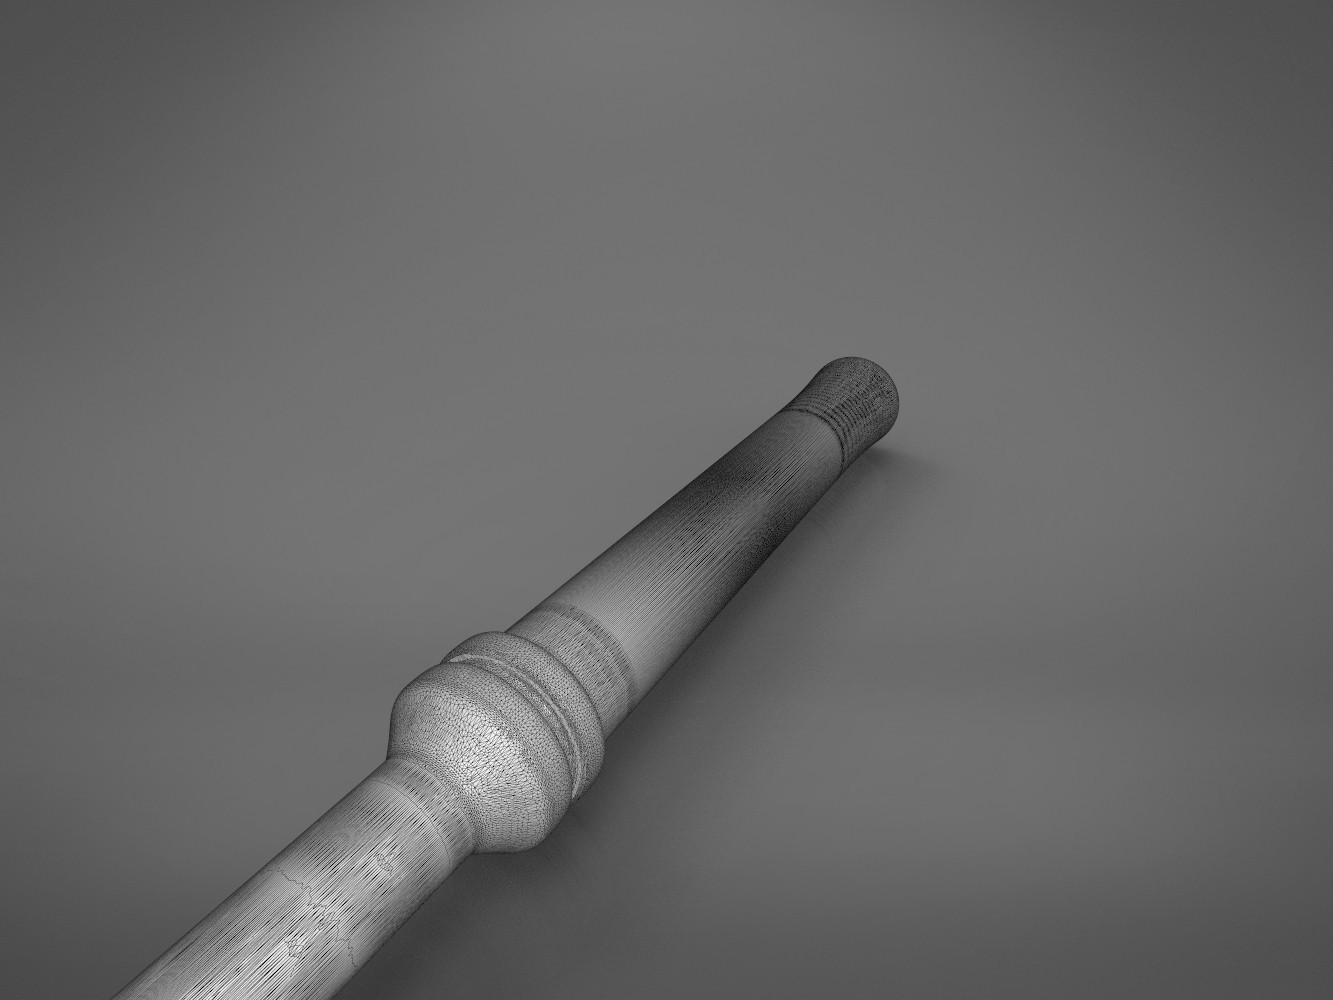 Potter2-detail_3.857.jpg Download STL file Harry Potter Wand version 2 - Harry Potter 3D print model • 3D print model, 3D-mon